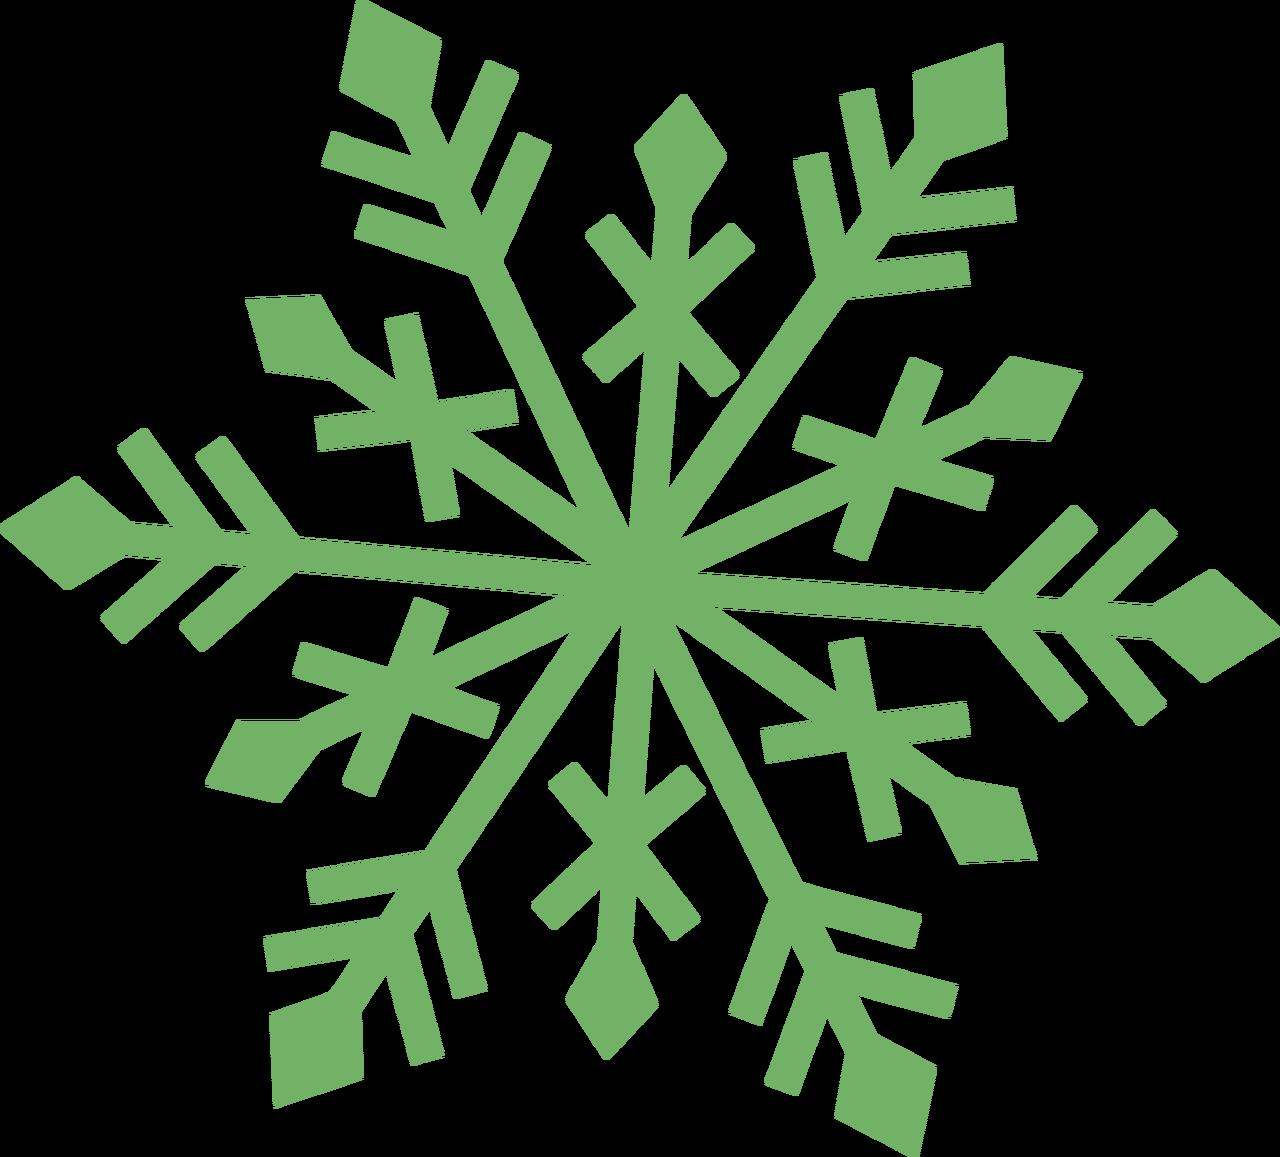 Merry & Bright Snowflake #4 SVG Cut File